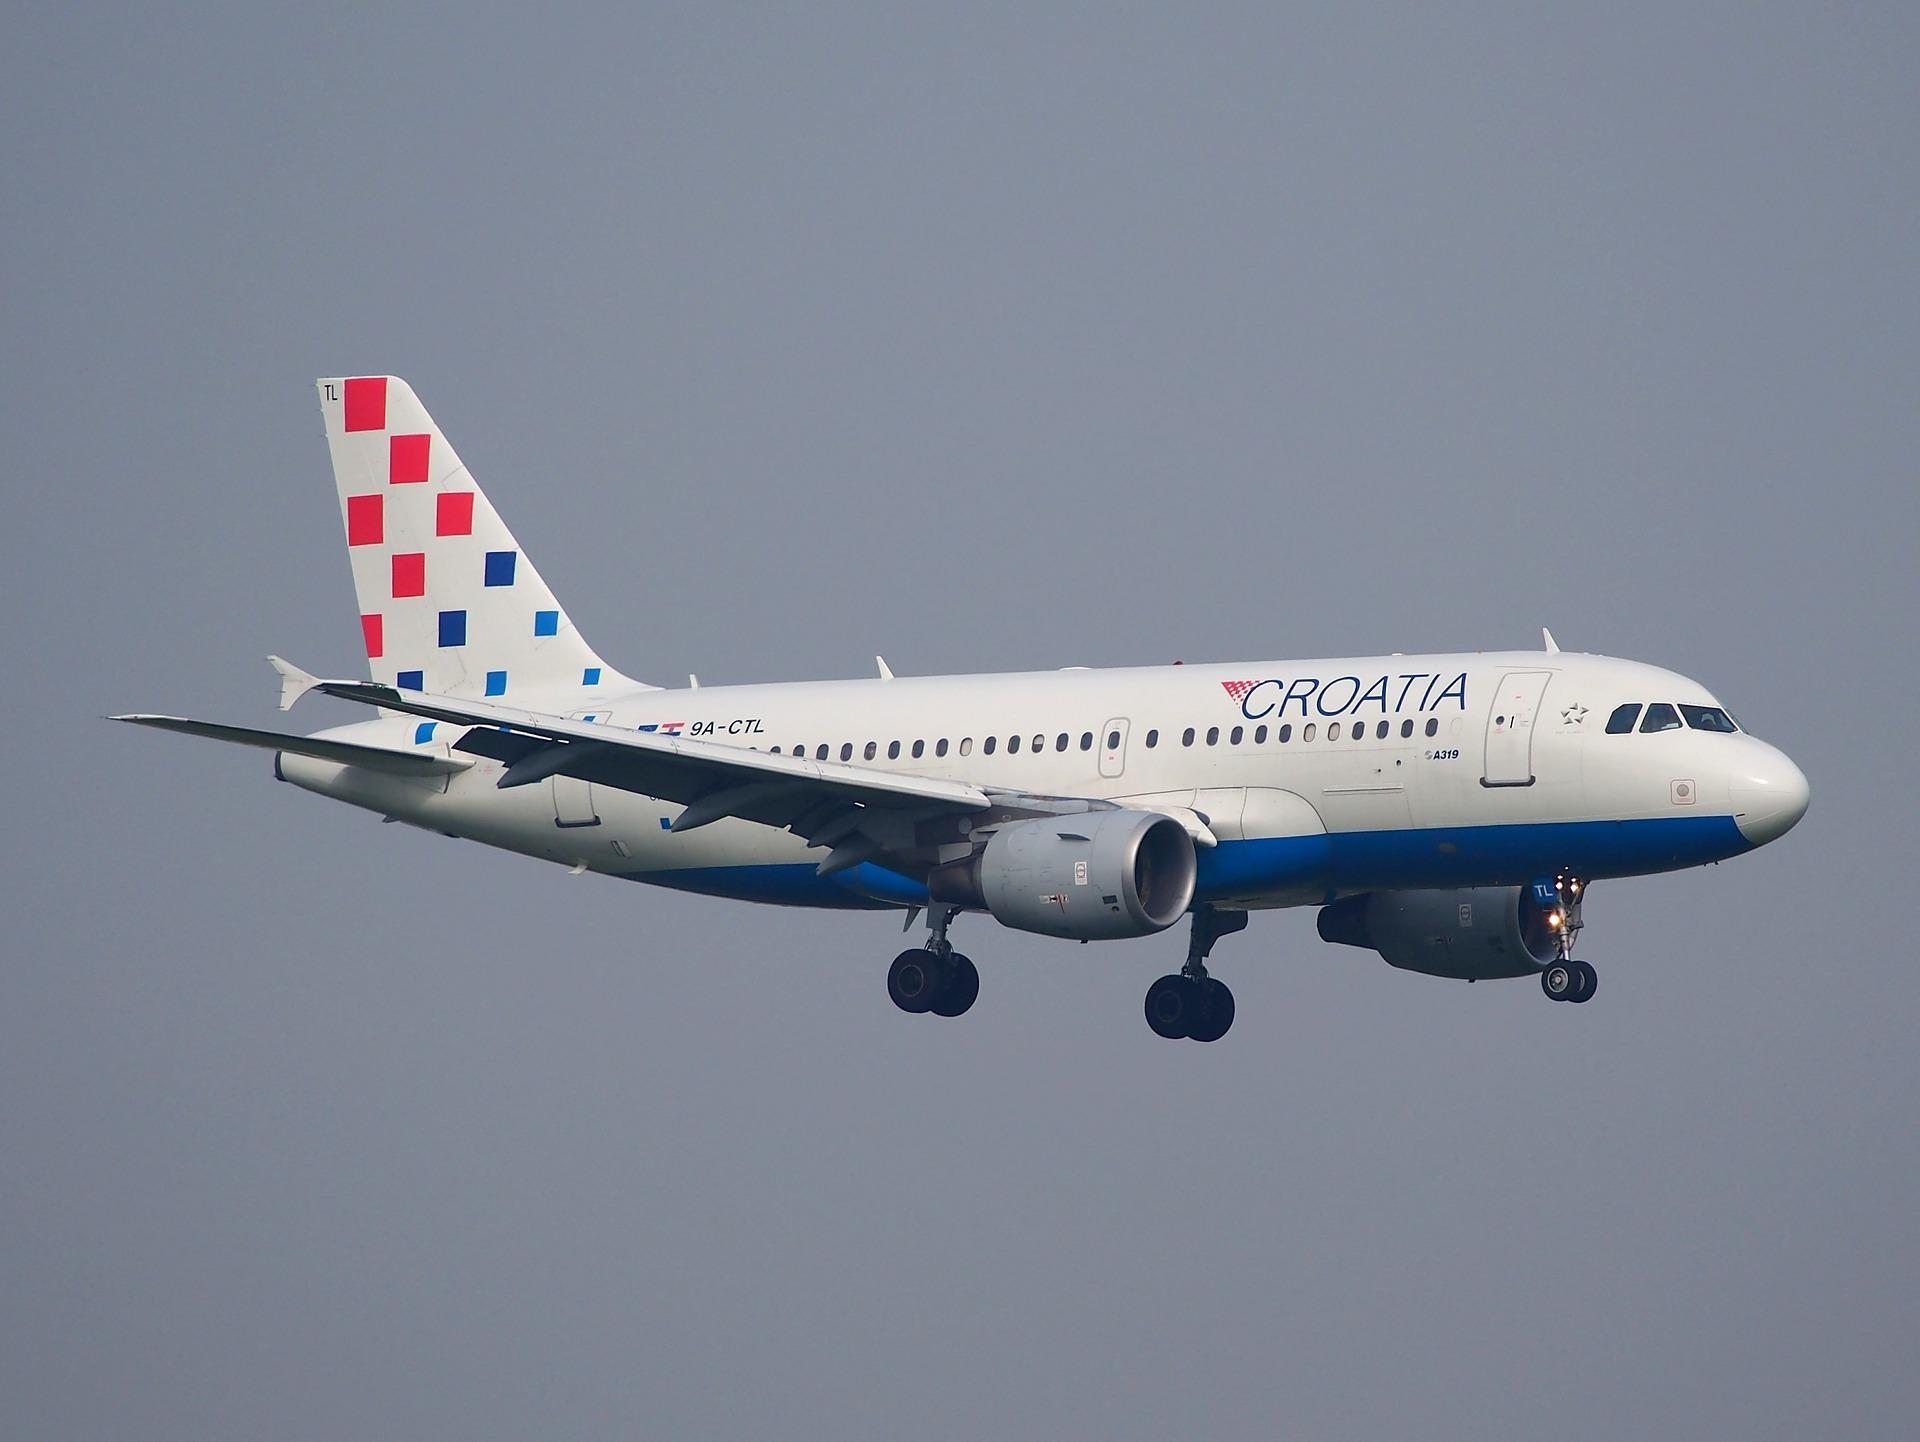 Croatia airlines reveals huge 30 percent discount on flights this week